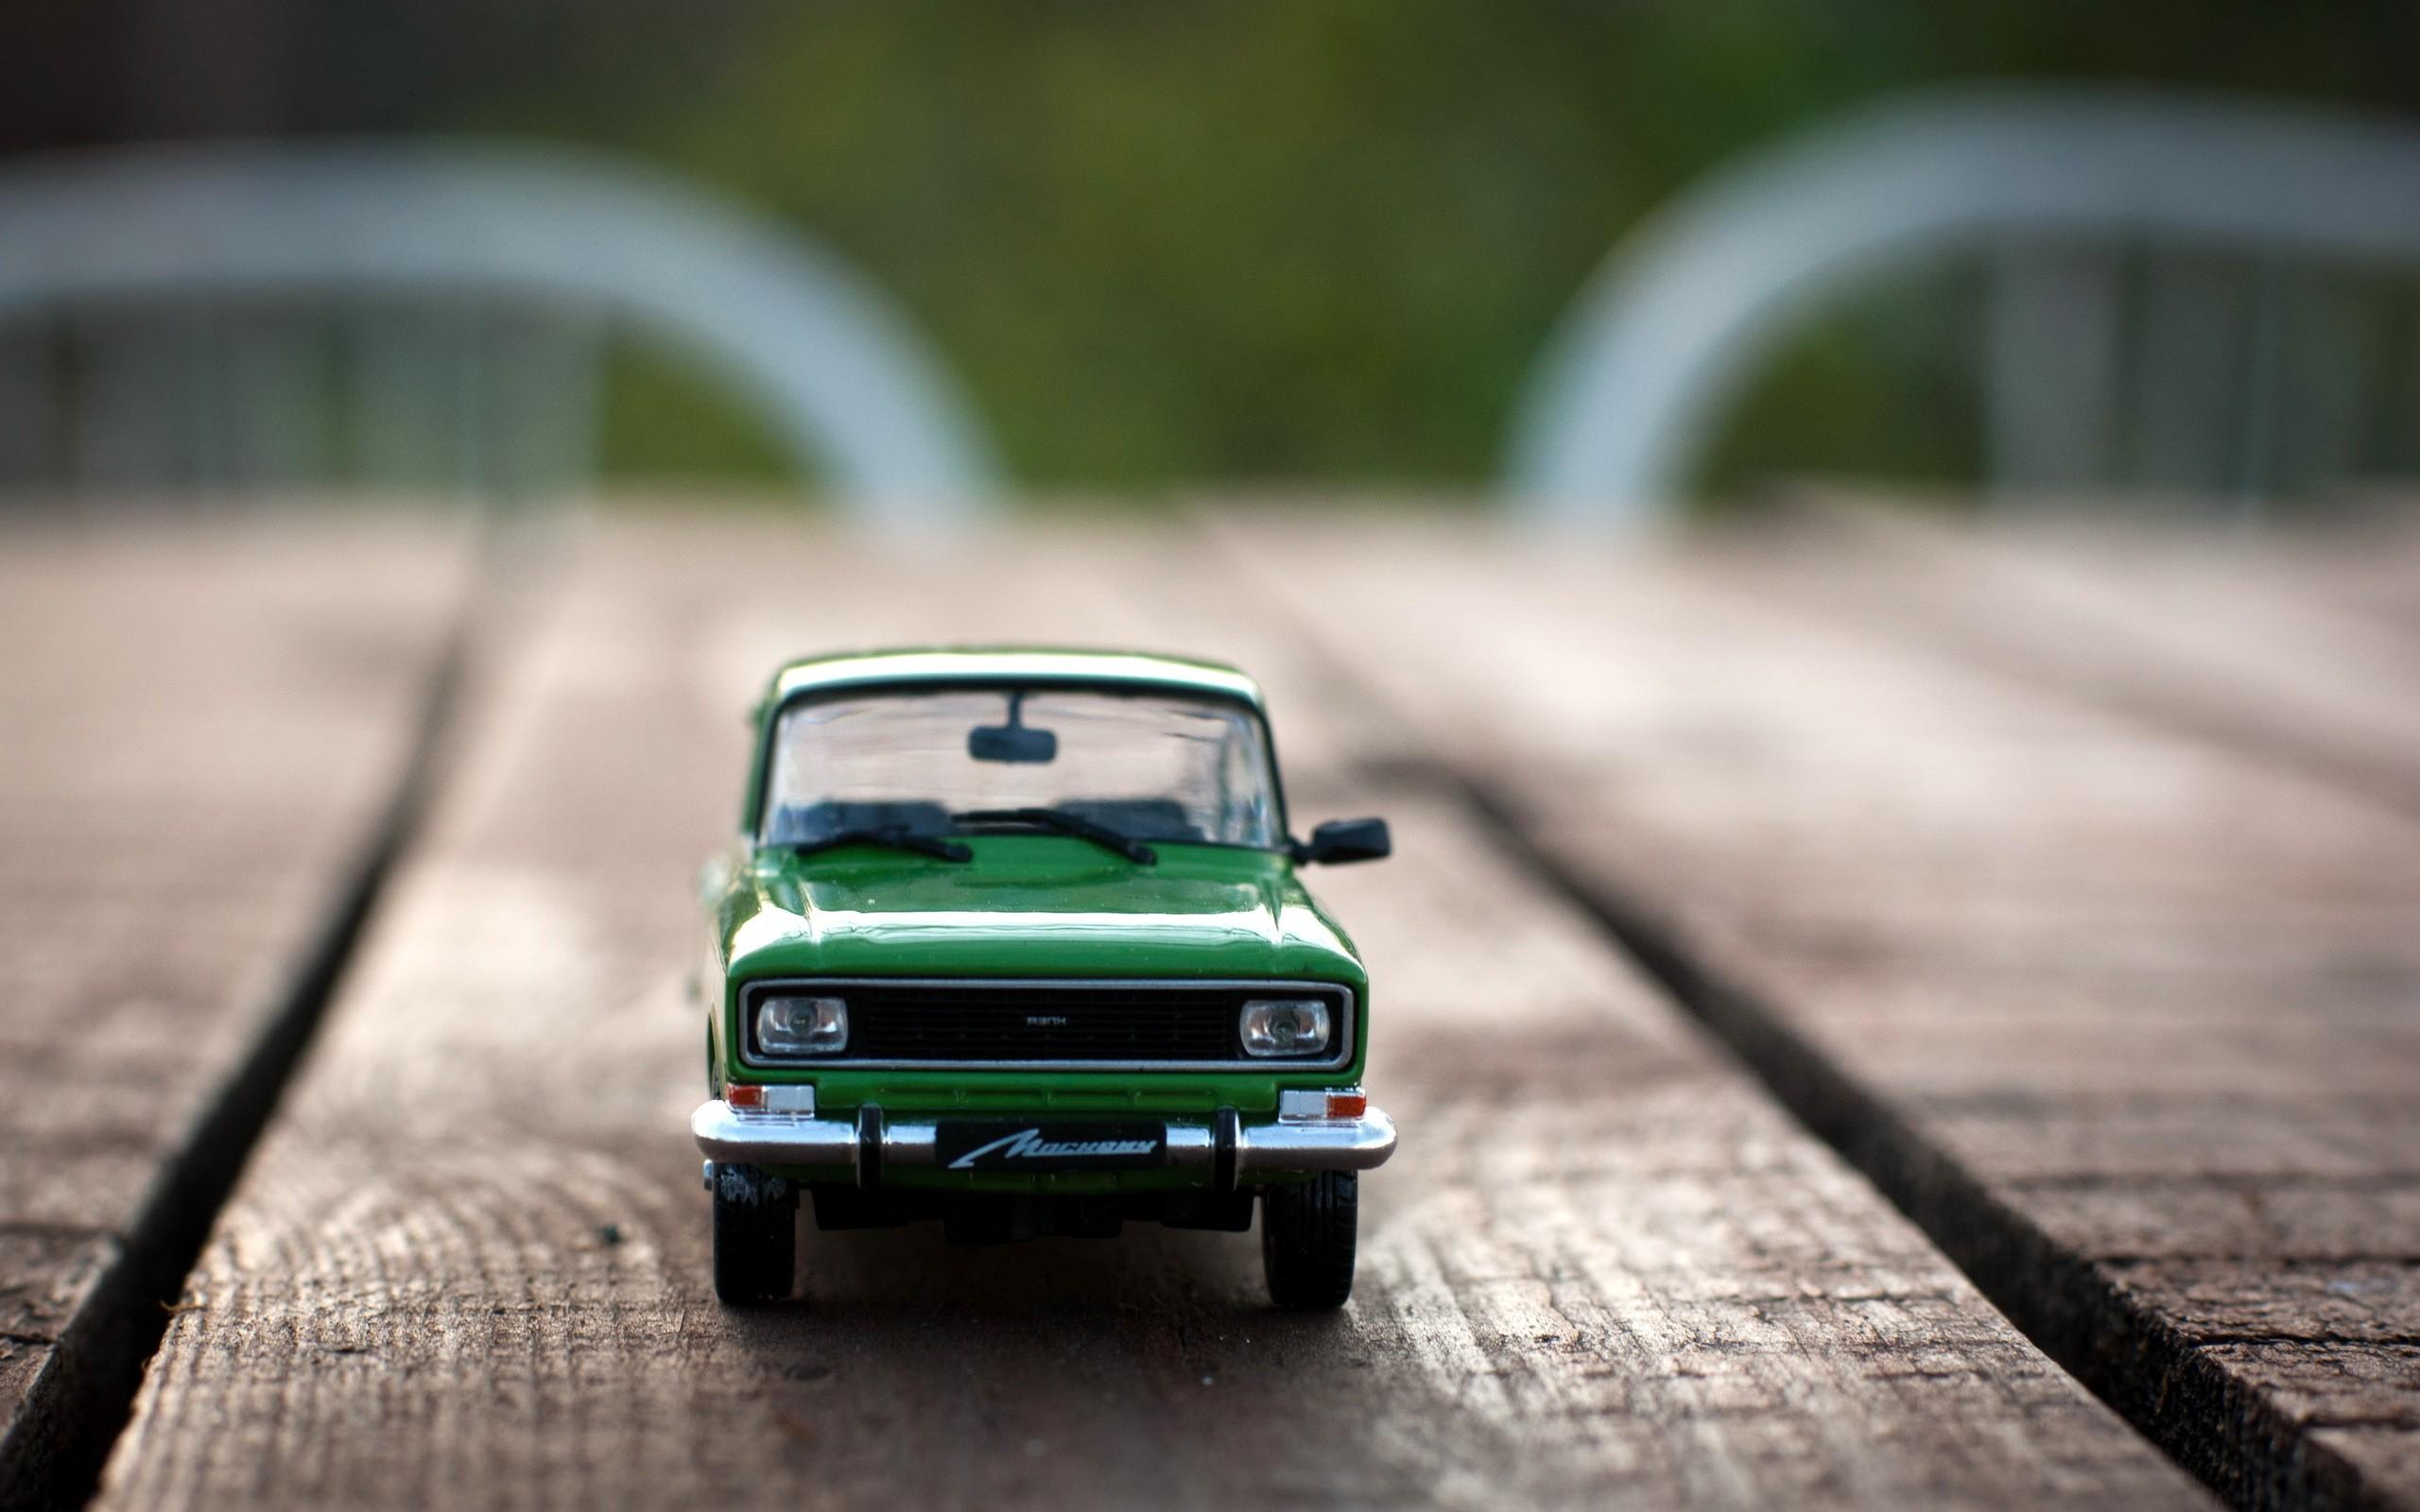 Wood cars soviet toys macro desk izh moskvich blurred background ...